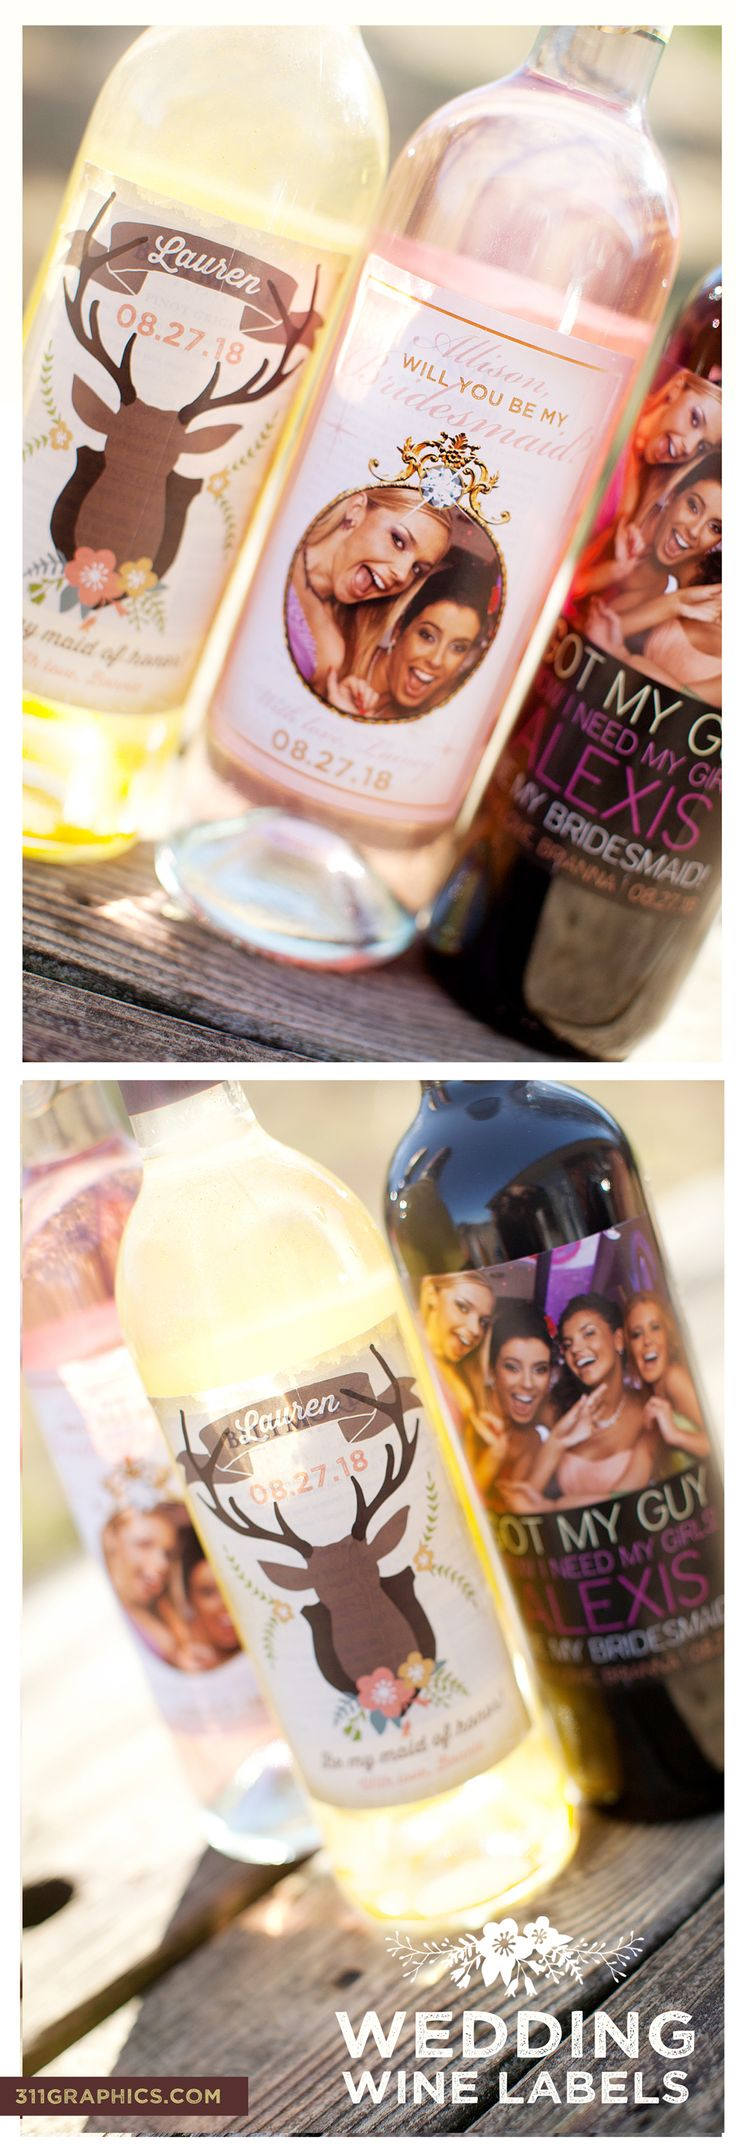 rustic wine labels, bridesmaid wine labels, maid of honor, #weddingfavors #winelabels #weddingwinelabels #weddinginspiration